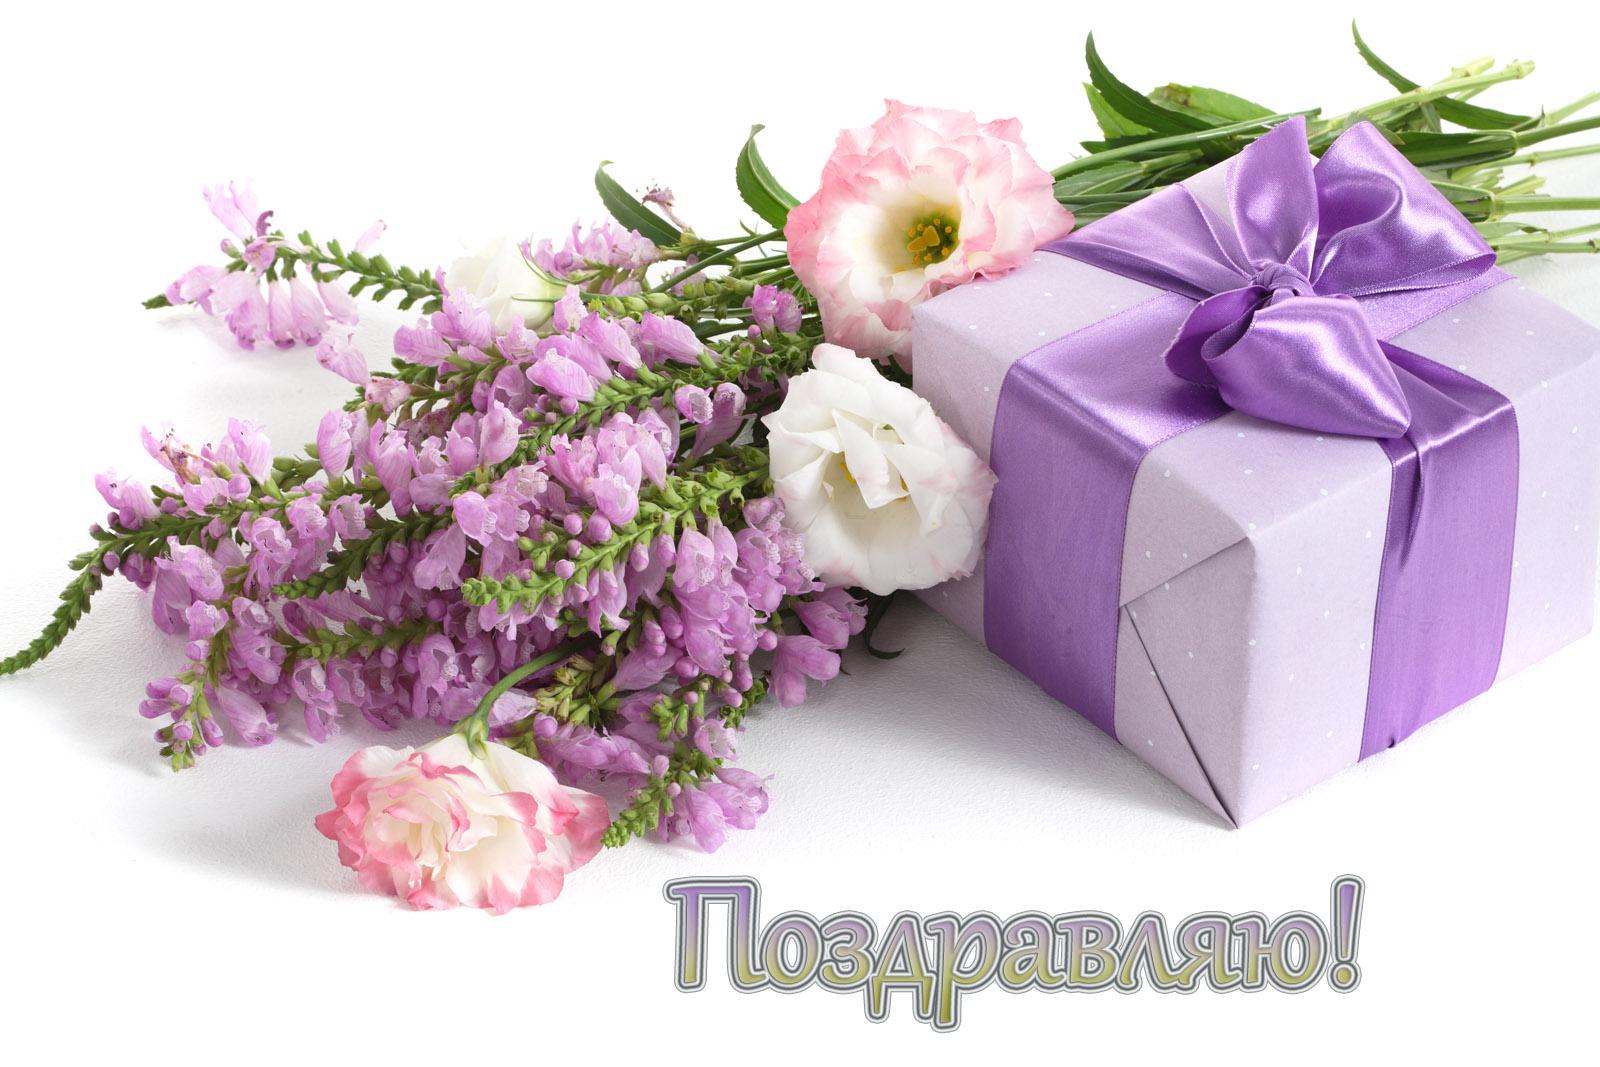 http://file.mobilmusic.ru/b2/38/17/972721.jpg